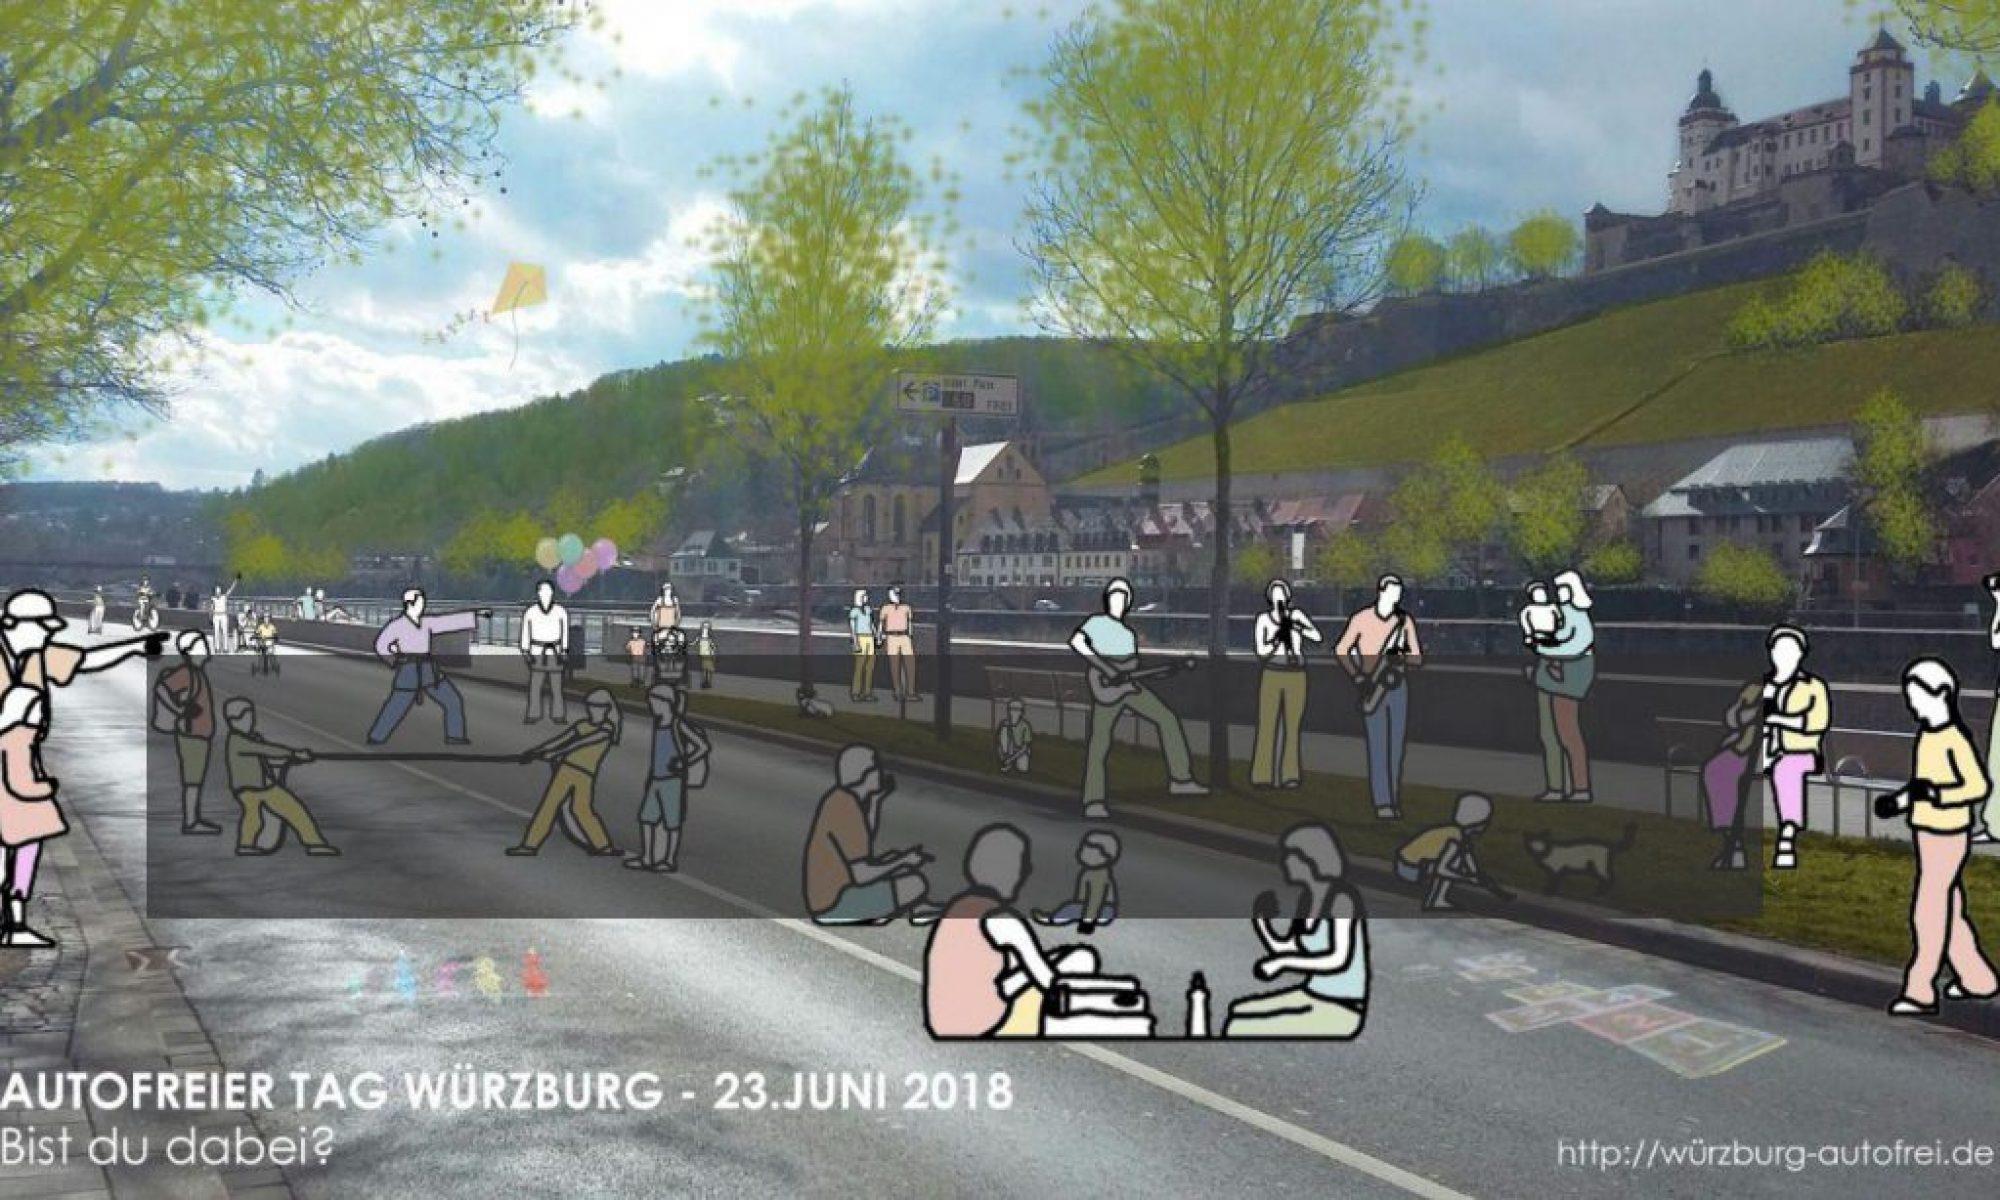 Autofreier Tag Würzburg  -  22.9.2020